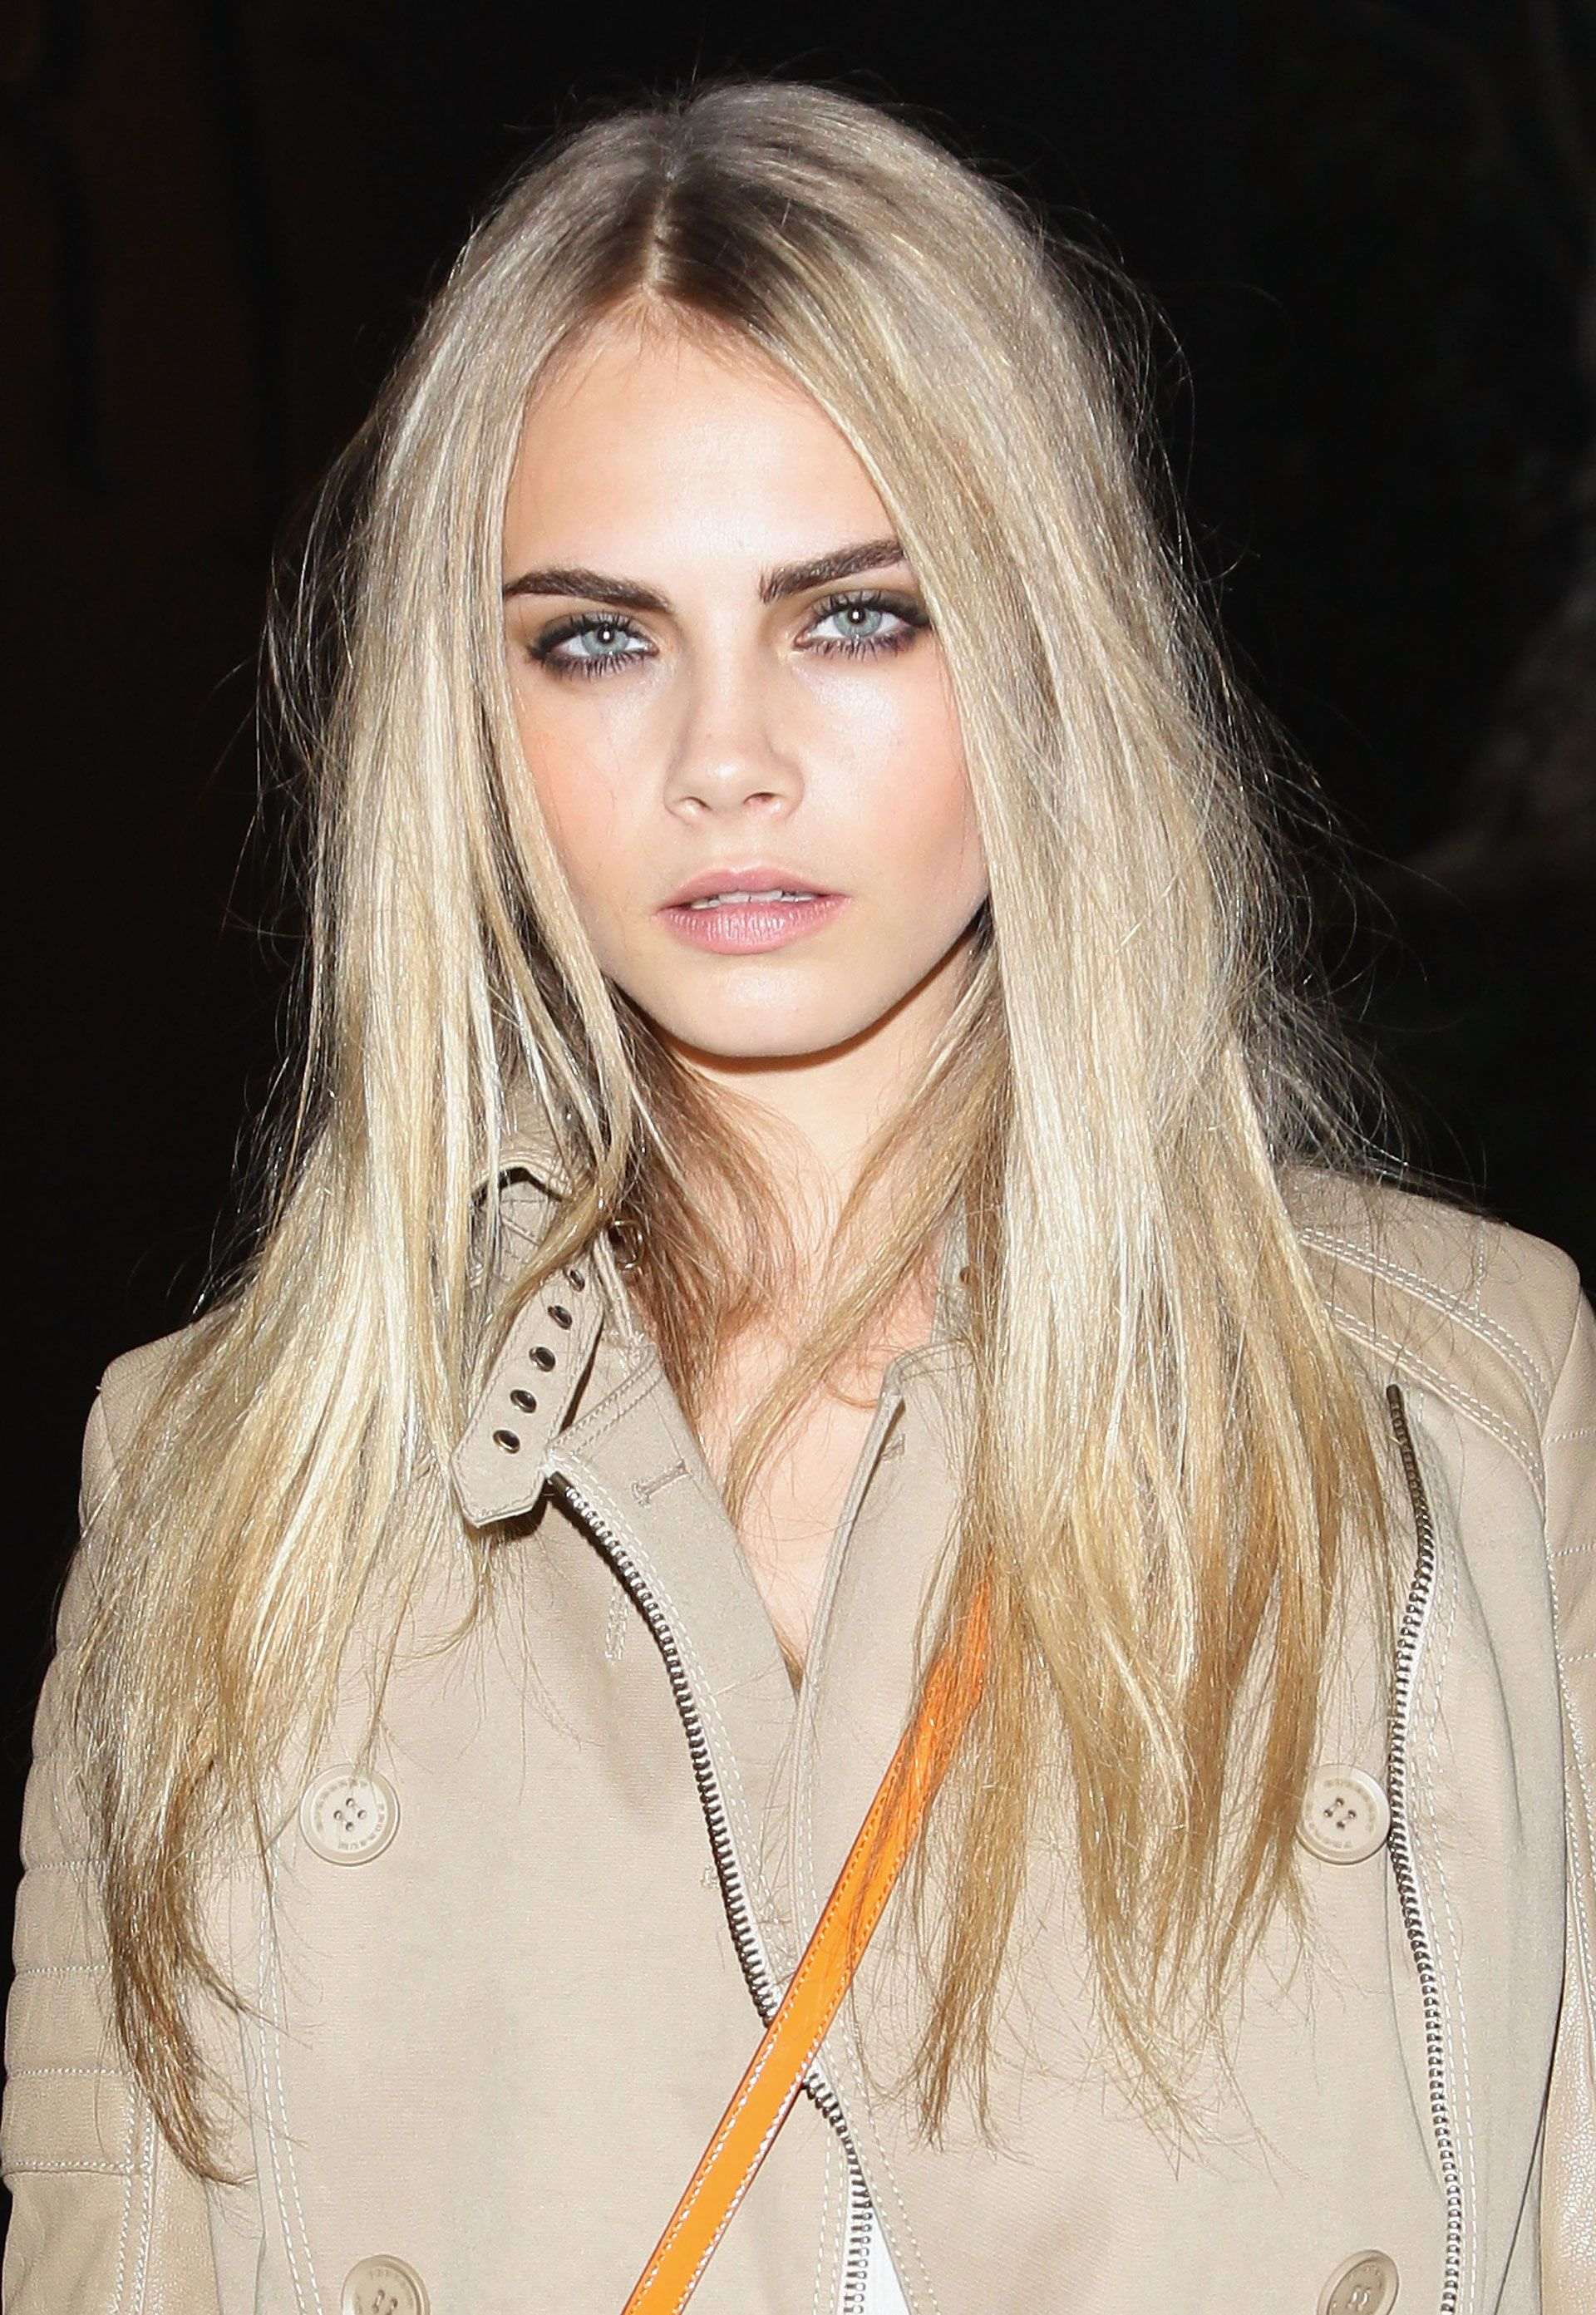 25 Stunning Photos of Cara Delevingne | Hurrr | Cara delevingne hair. Dark eyebrows. Beauty